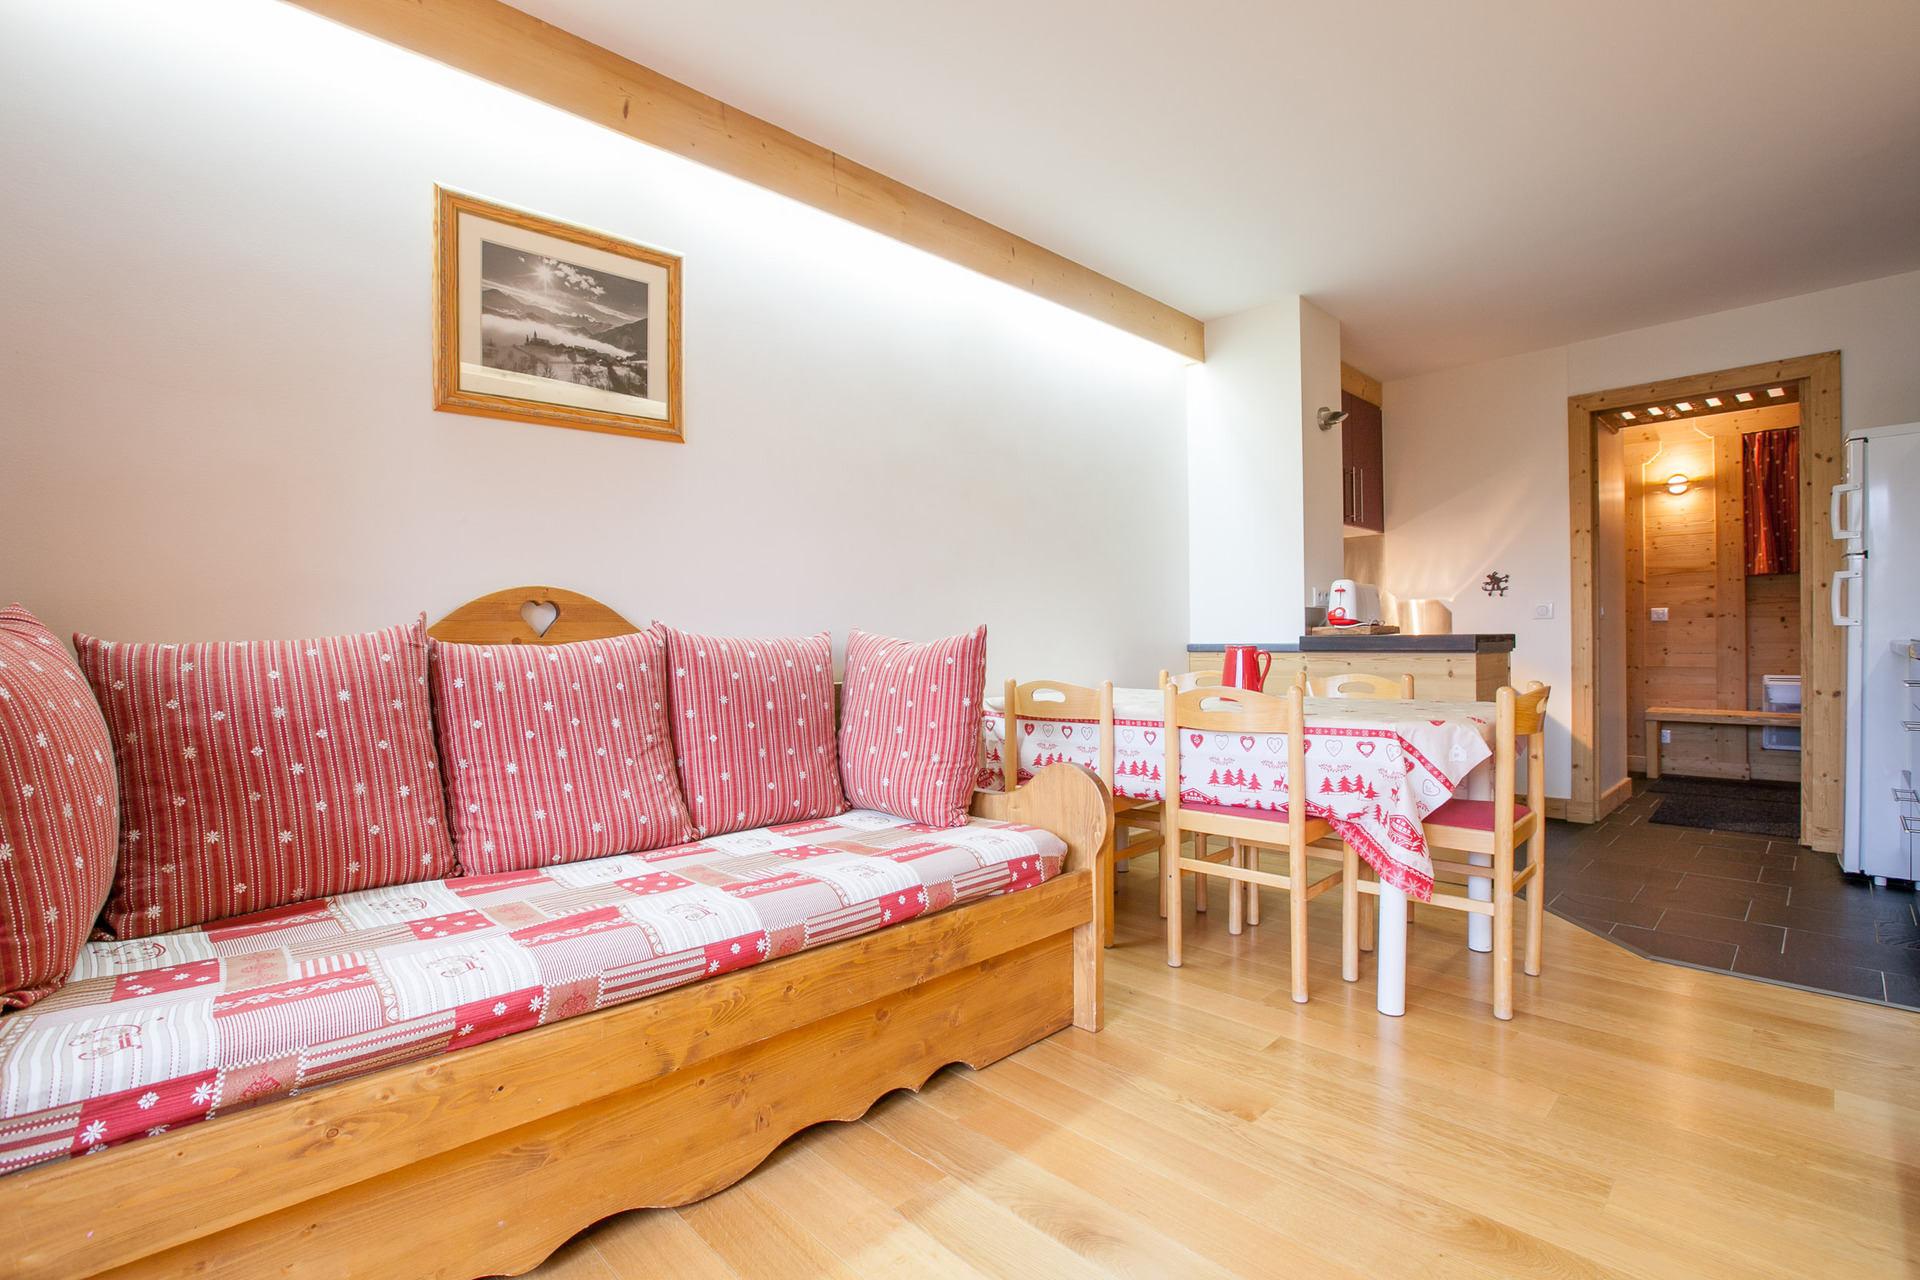 Rent a 3 rooms (2 bedrooms) at Avoriaz